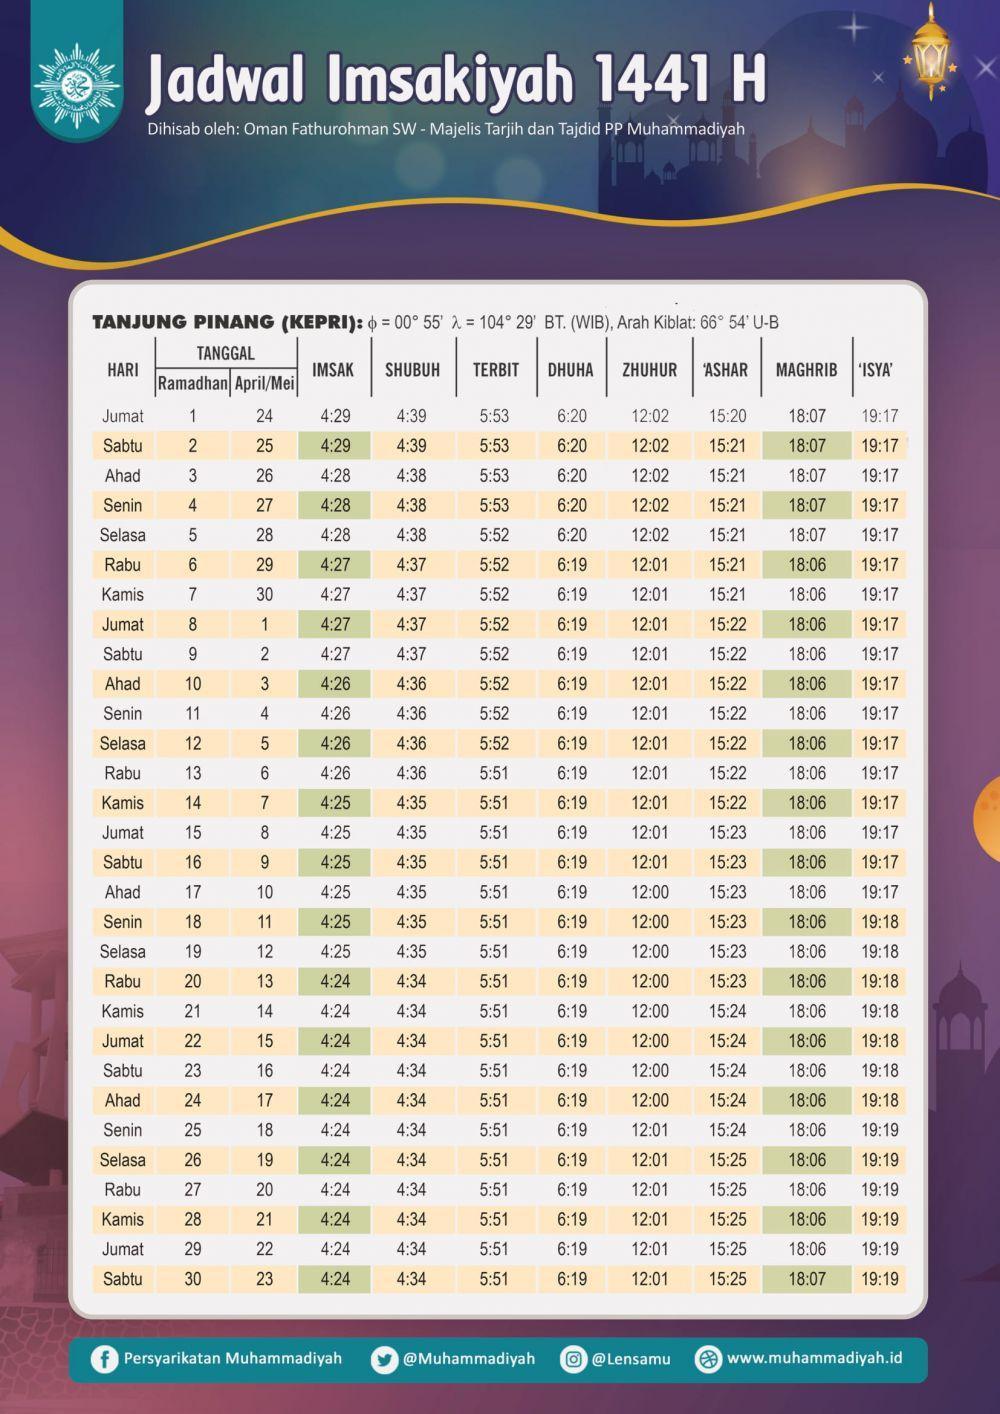 Jadwal Imsakiyah dan Buka Puasa Ramadan 1441 H/2020 M, Tanjung Pinang